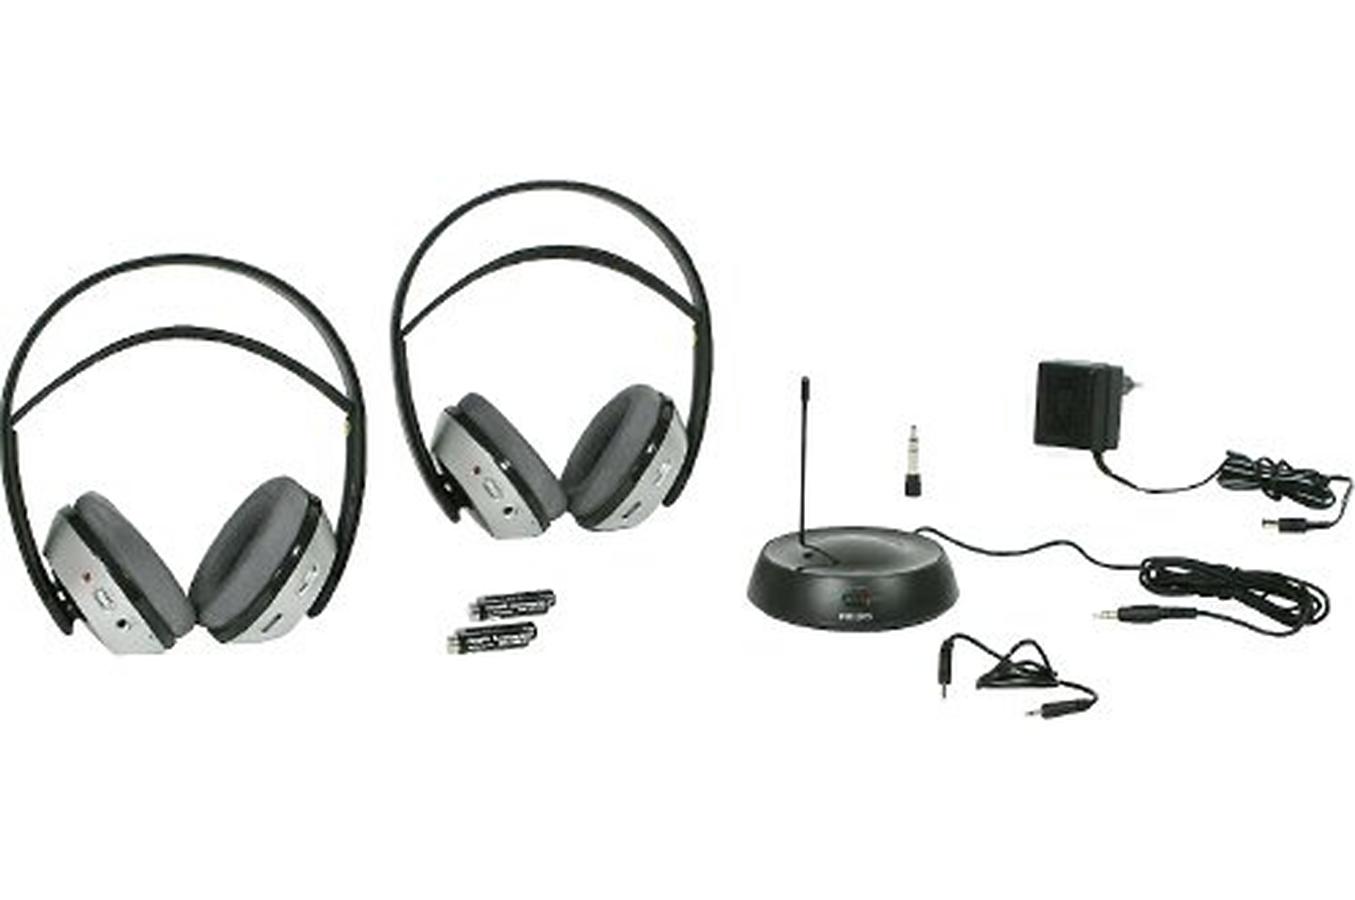 casque tv sans fil philips hc 8441 hc8441 1076167 darty. Black Bedroom Furniture Sets. Home Design Ideas